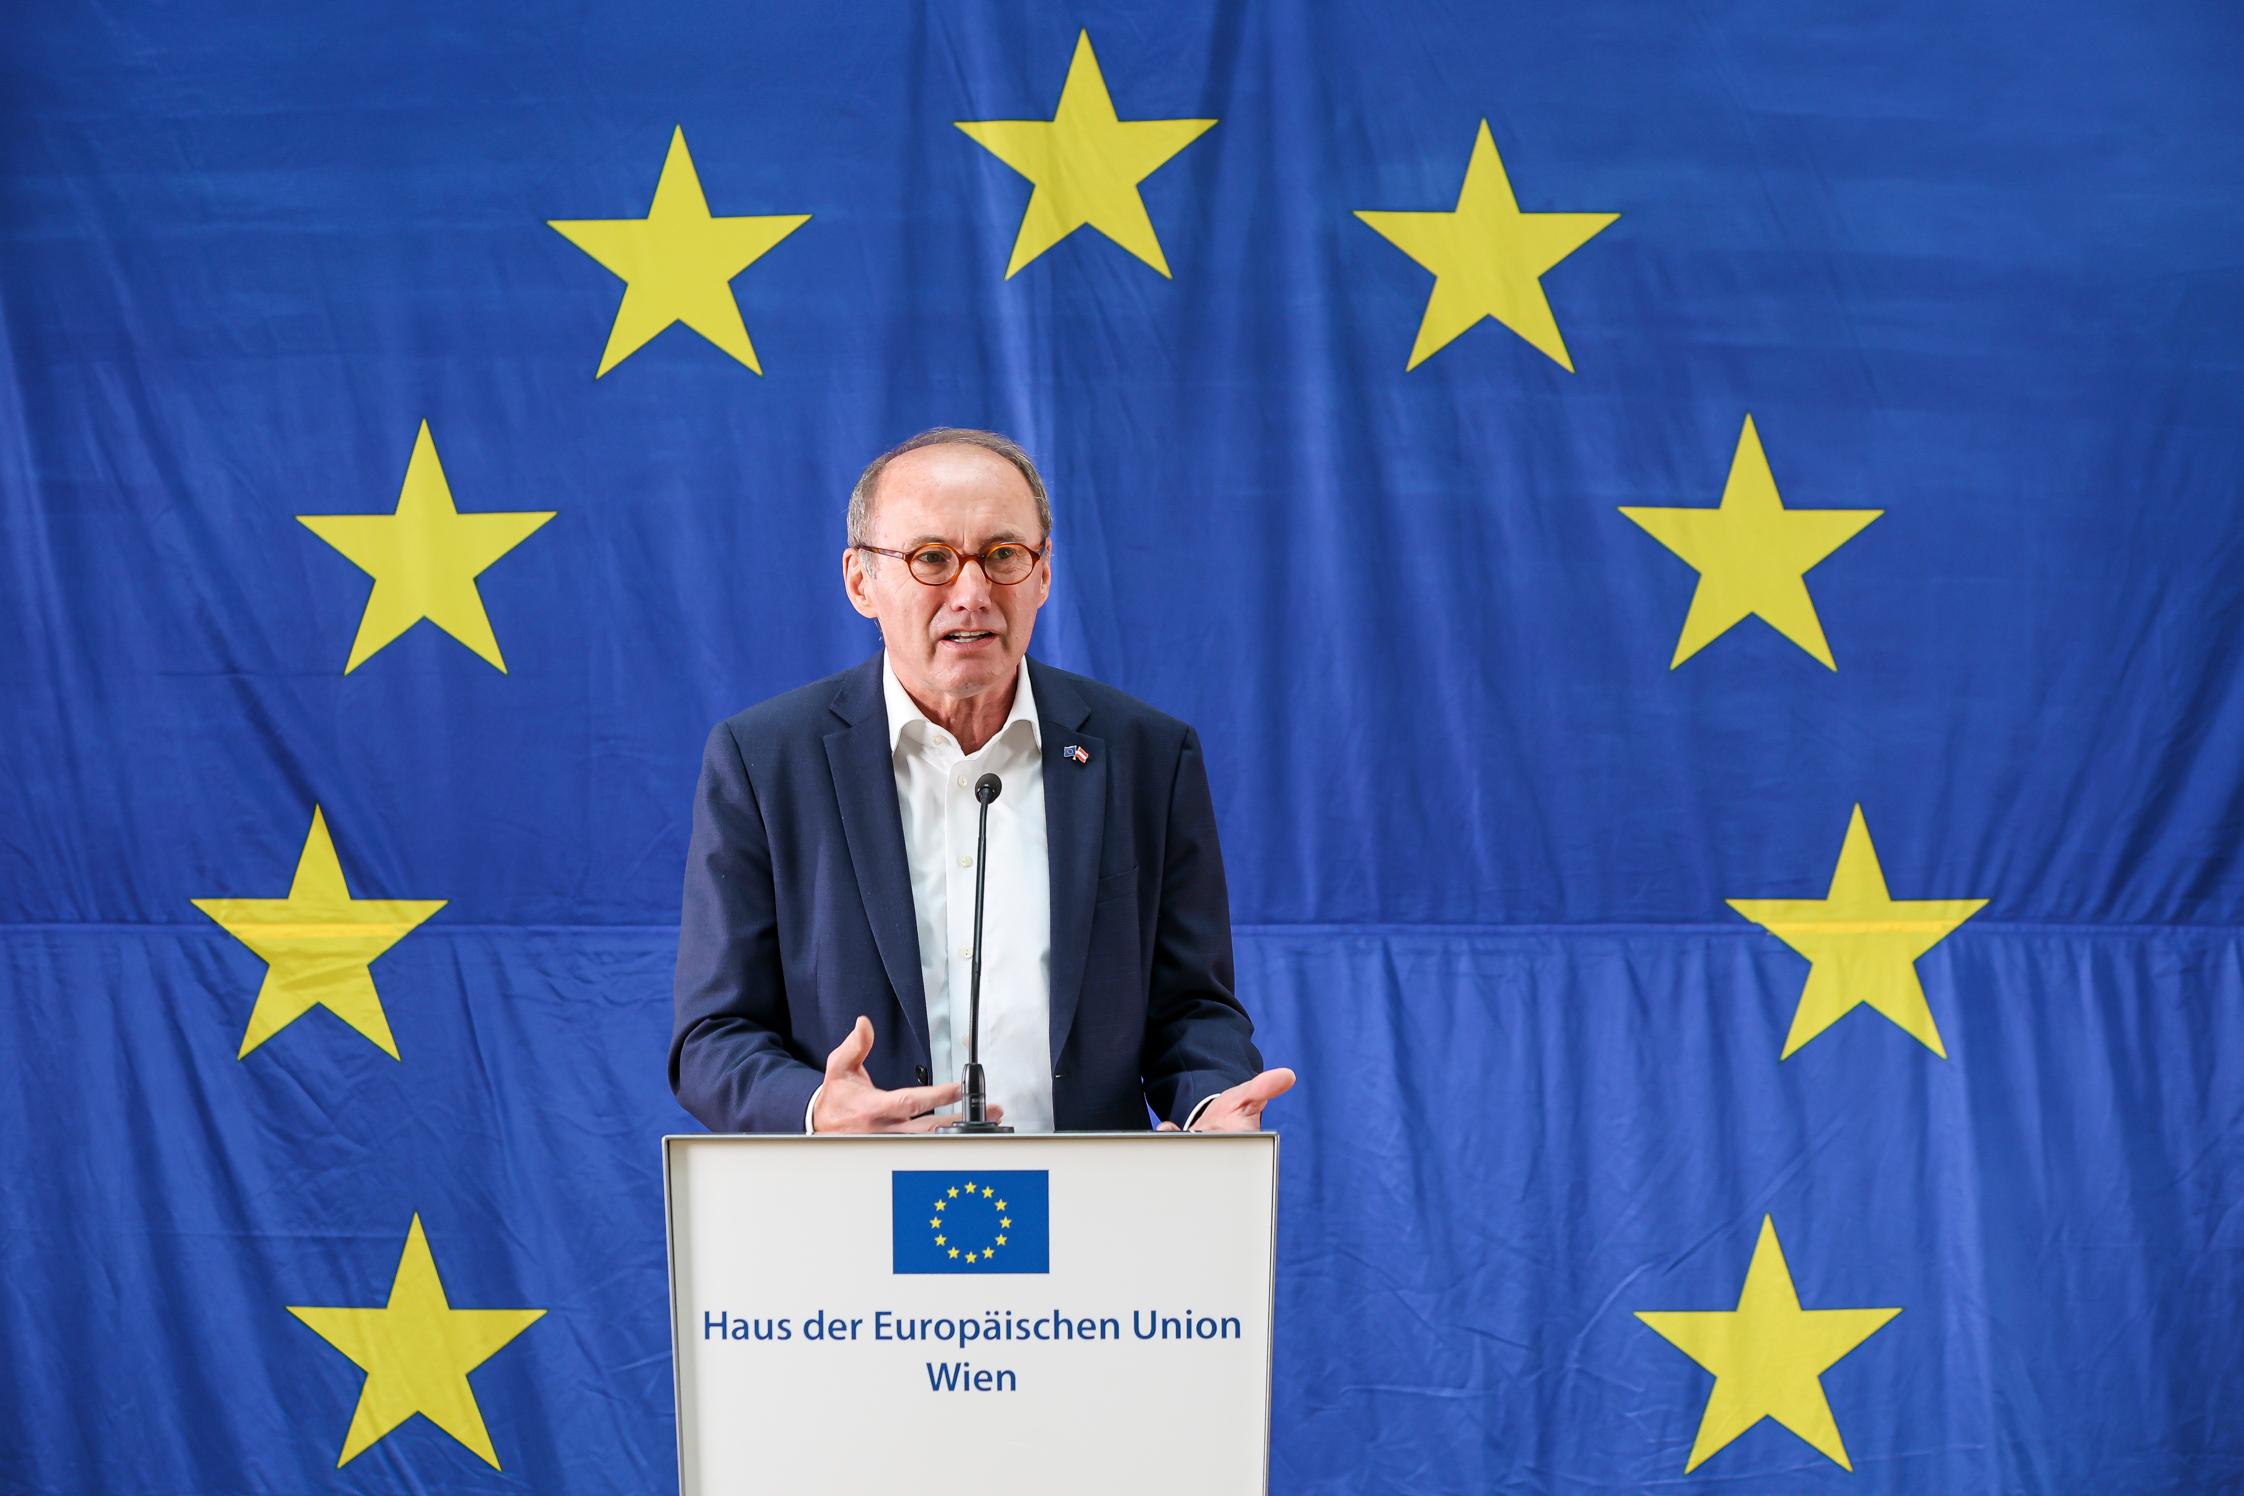 Verleihung des Europäischen Bürgerpreises